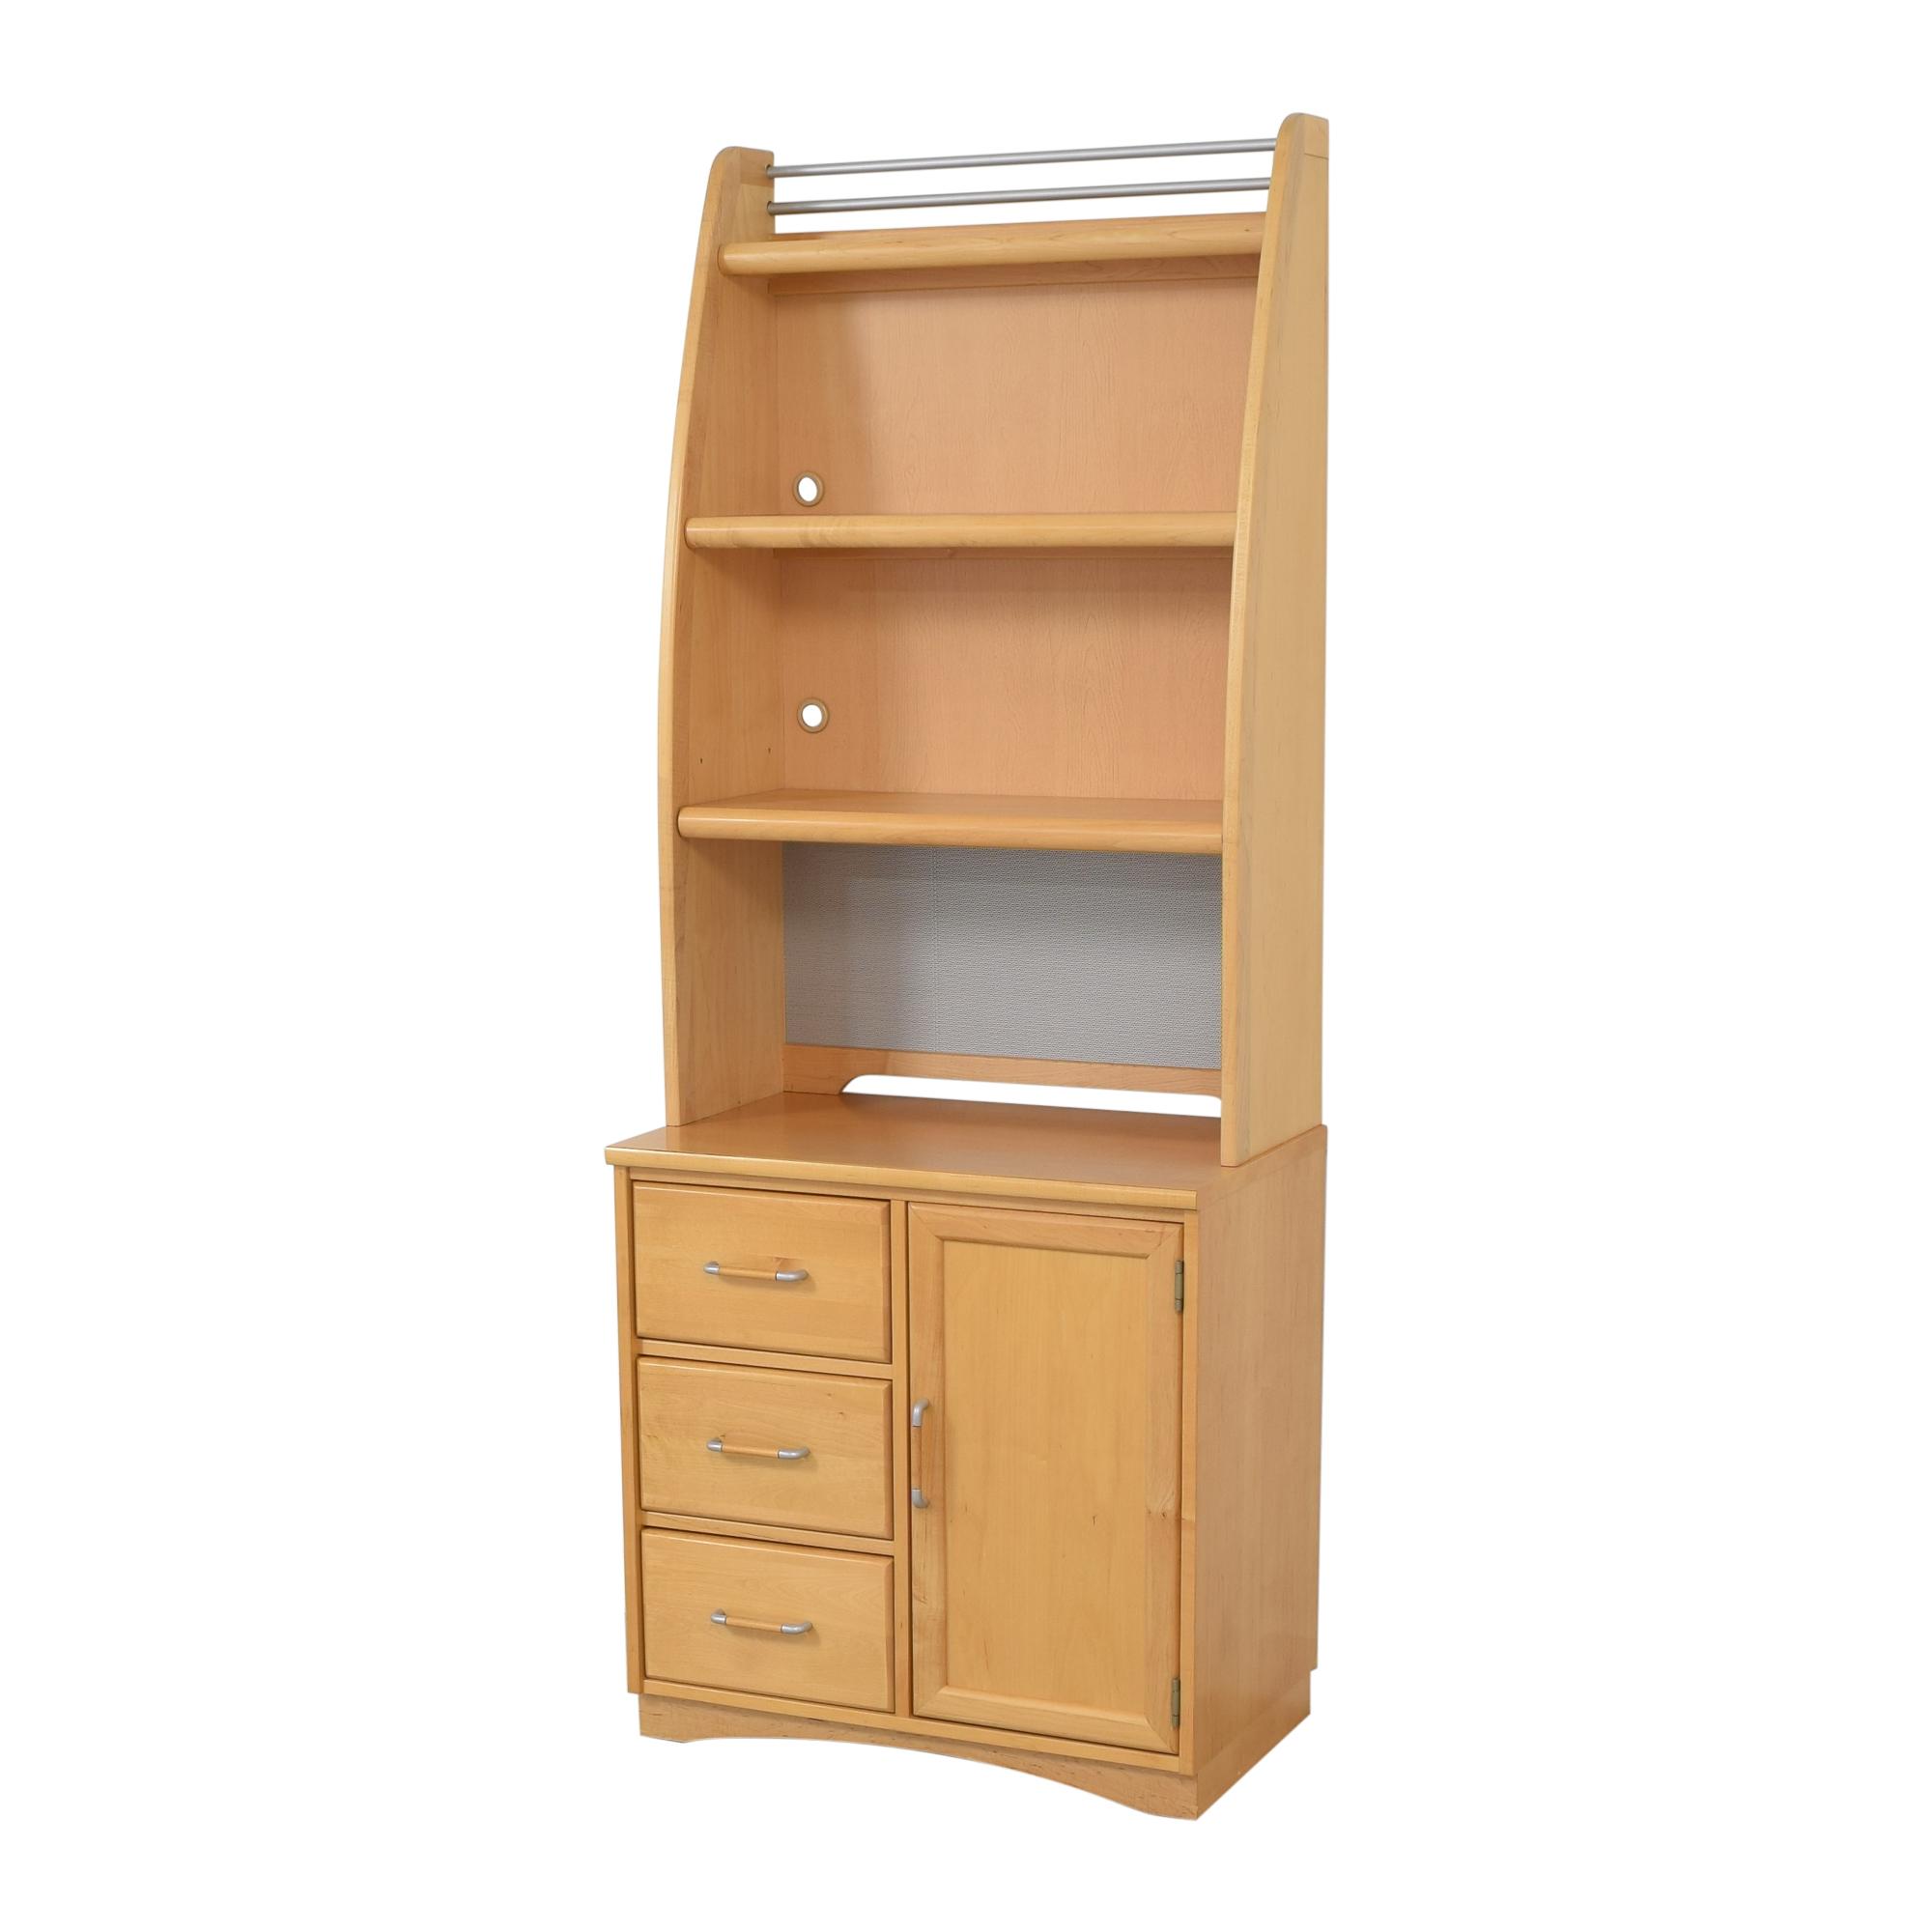 Stanley Furniture Stanley Furniture Modular Computer Storage Bookcases & Shelving